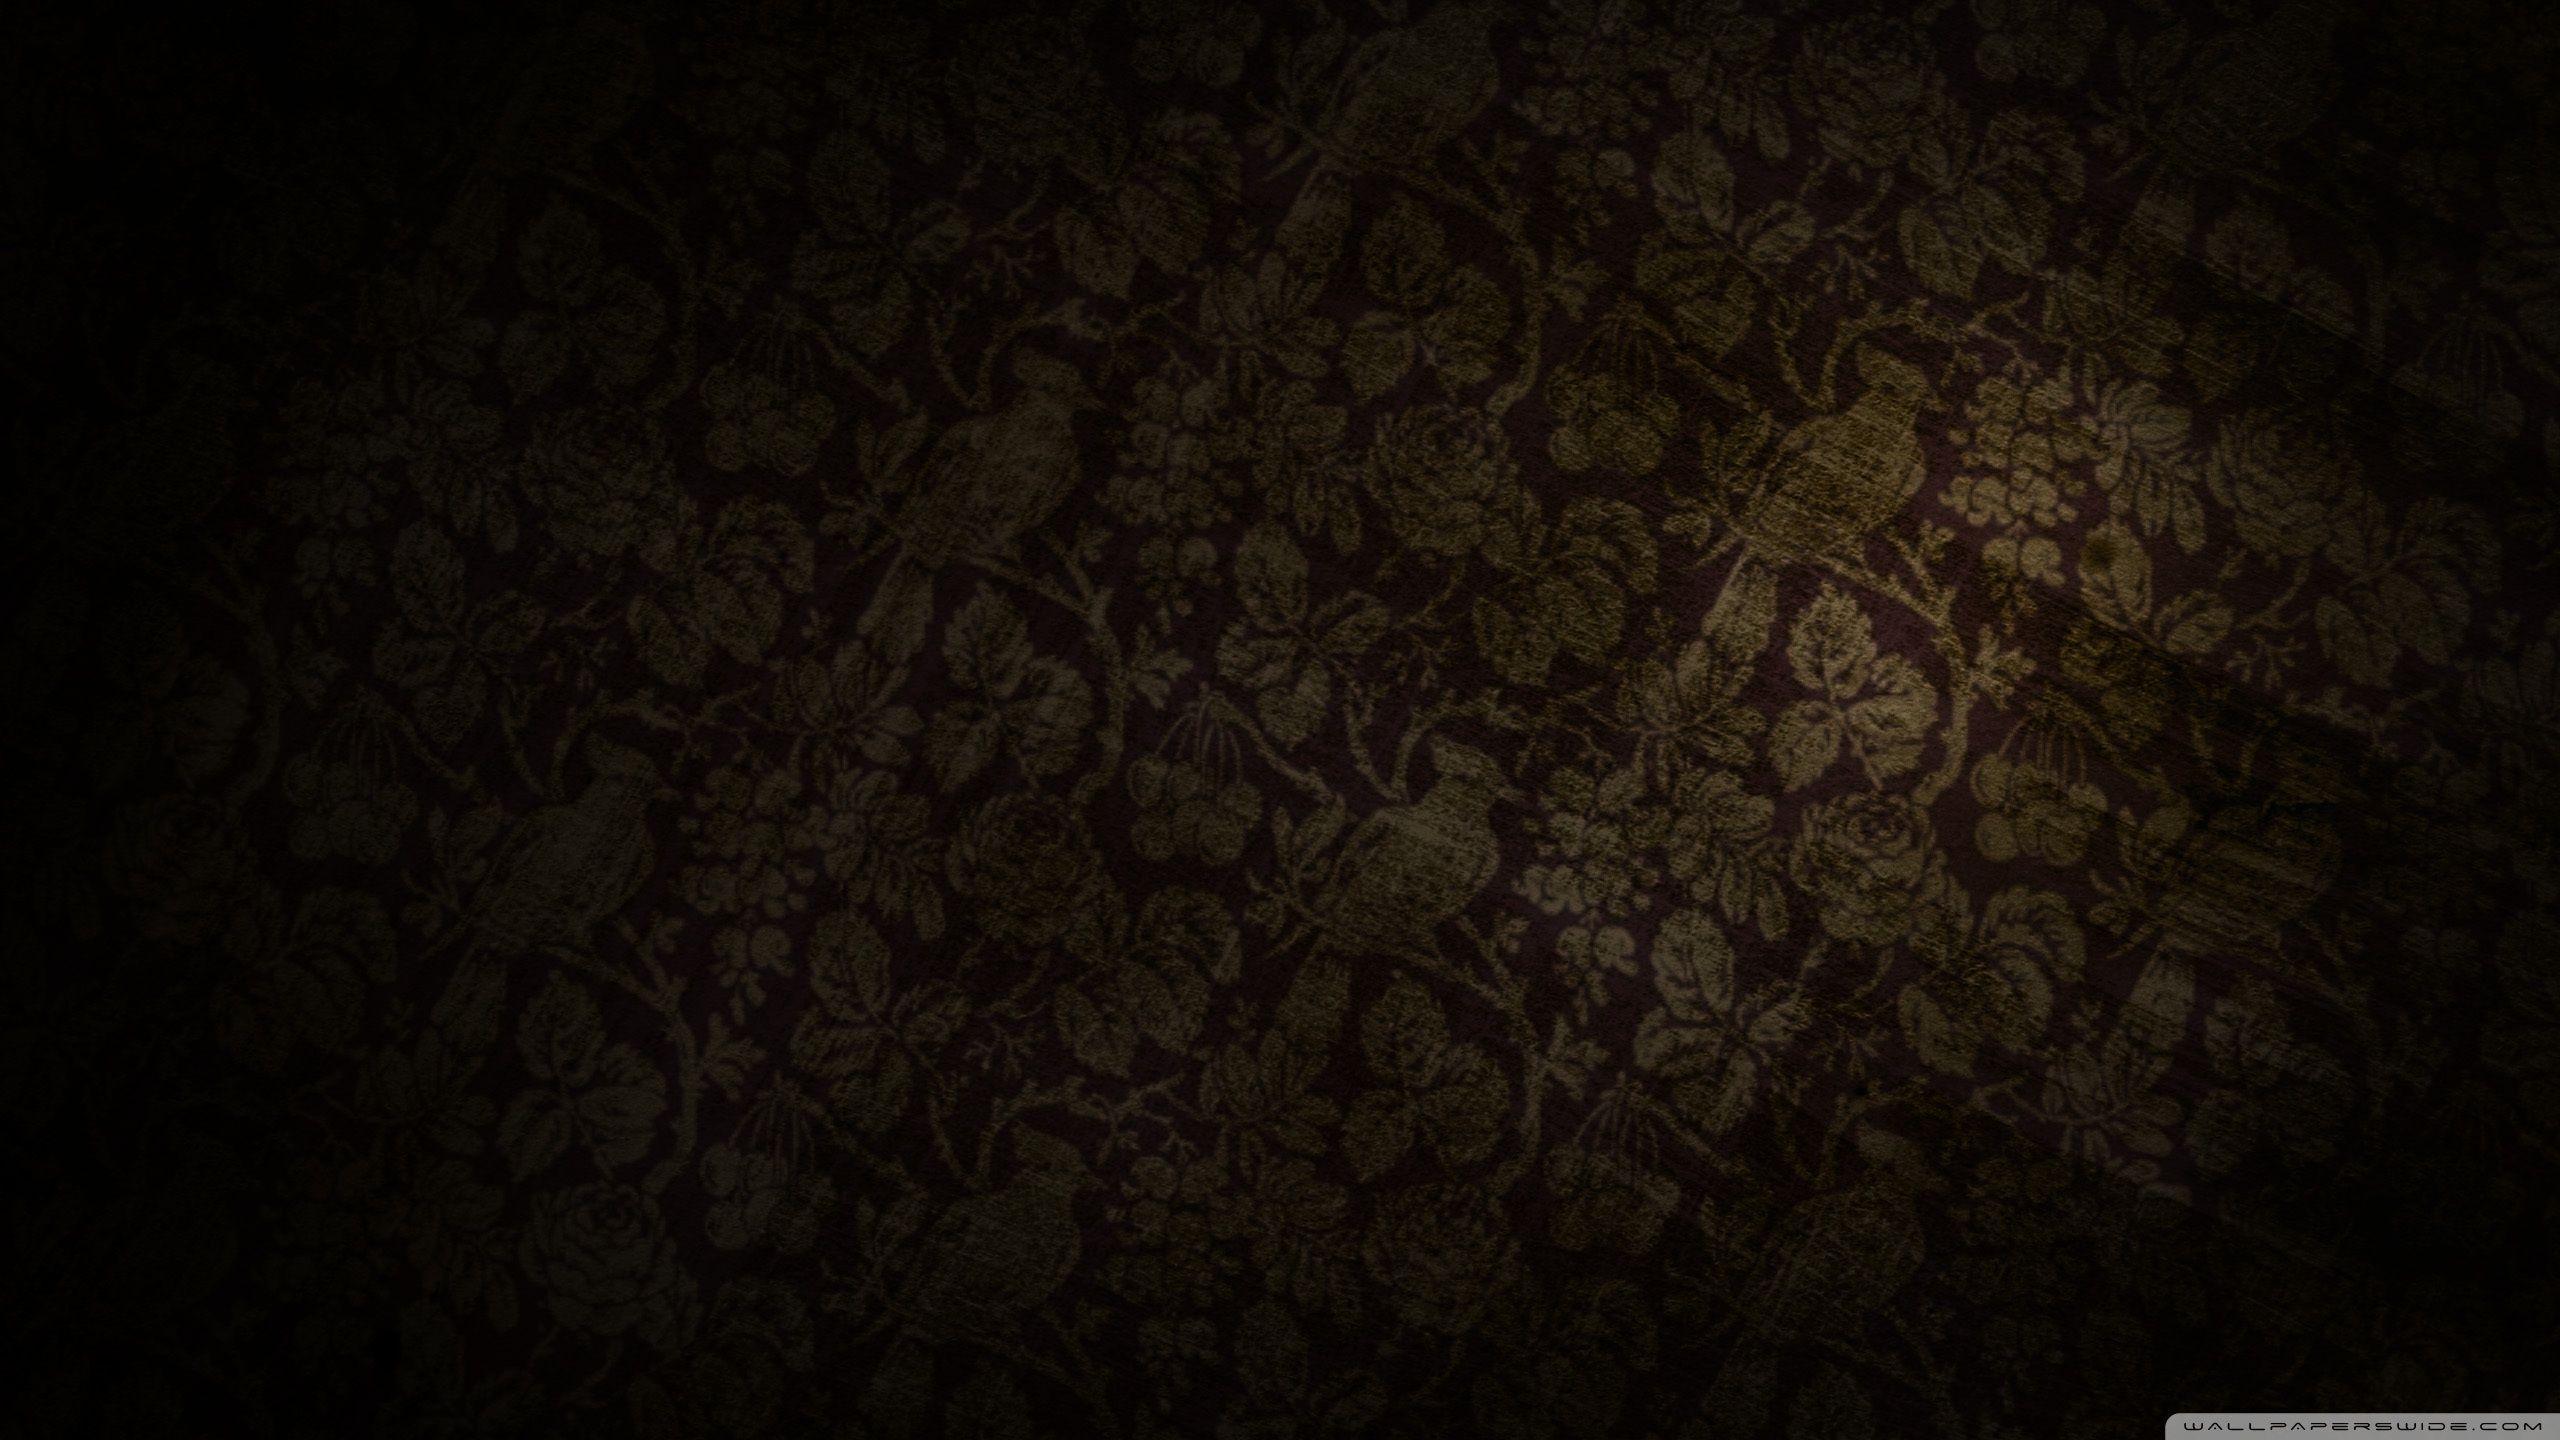 Dark Backgrounds Hd Wallpaper Cave